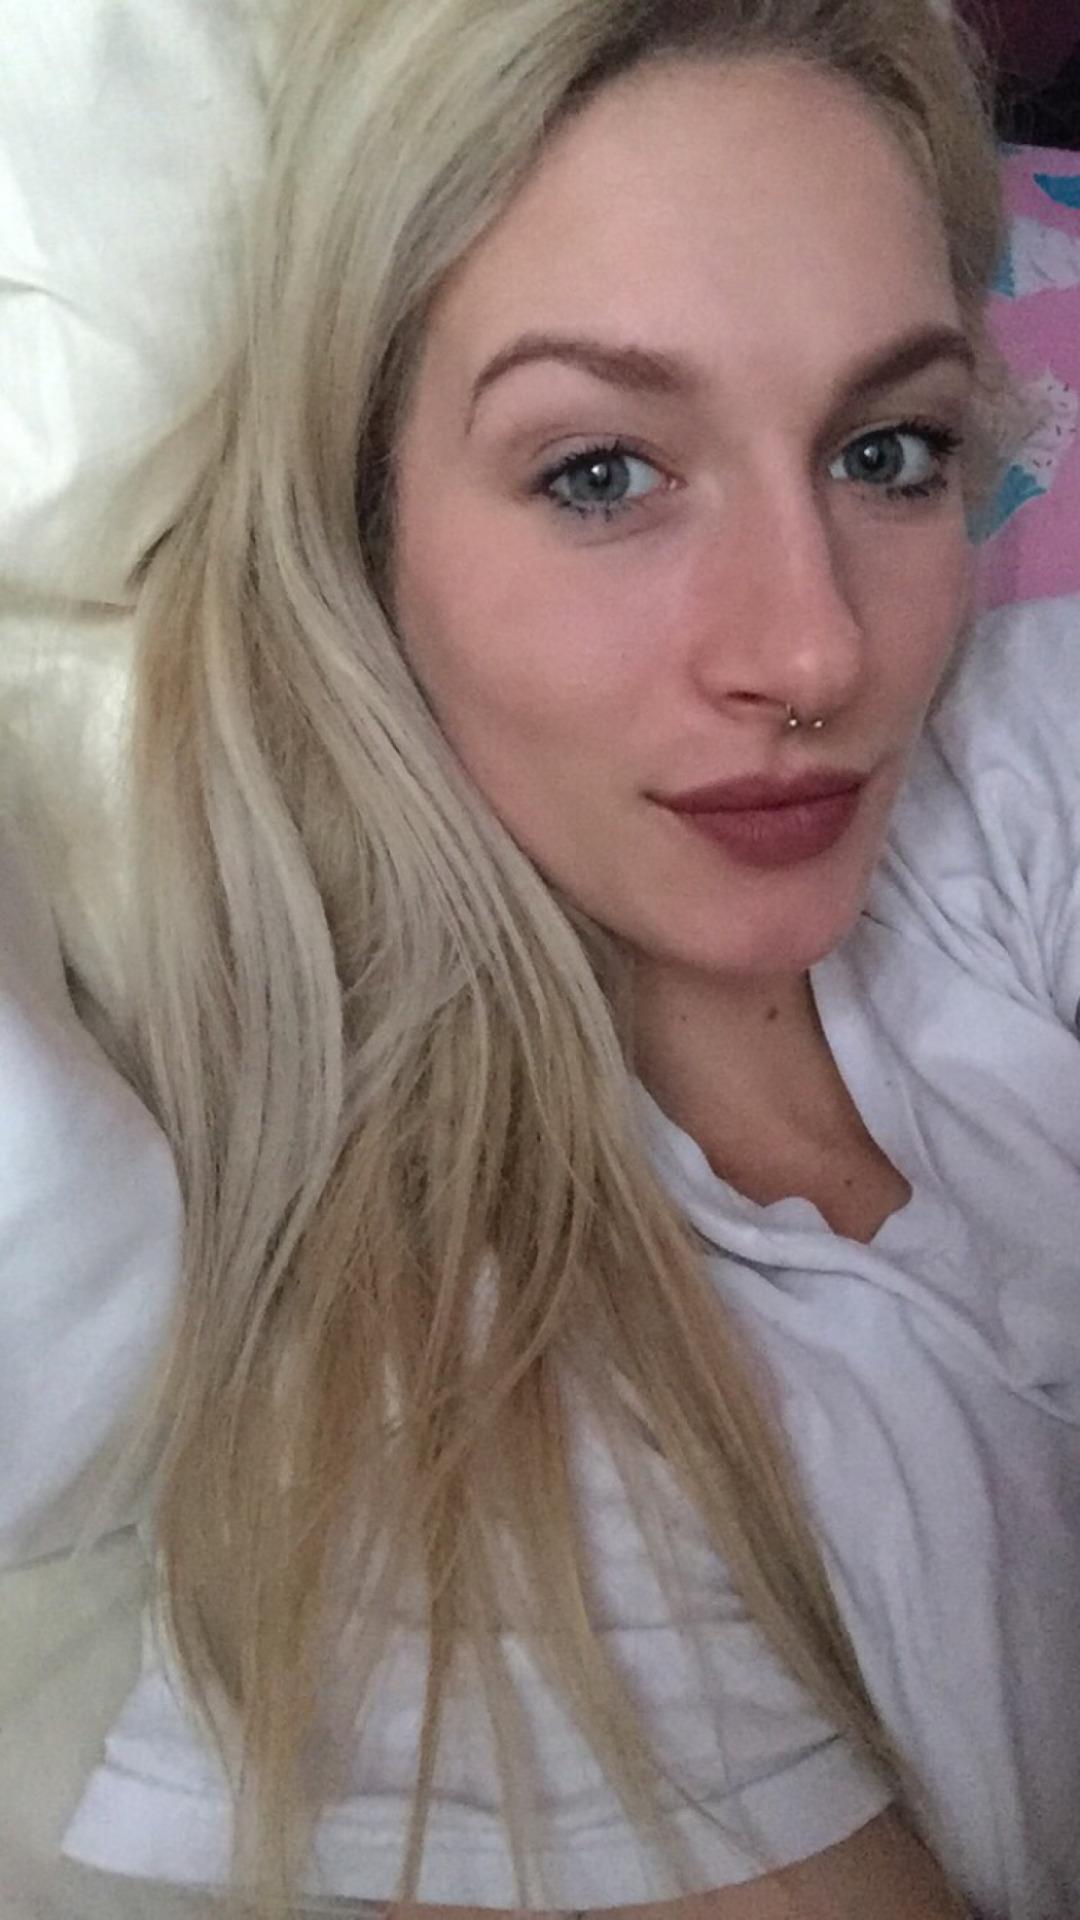 selfie coquin de fille sexy du 34 en manque